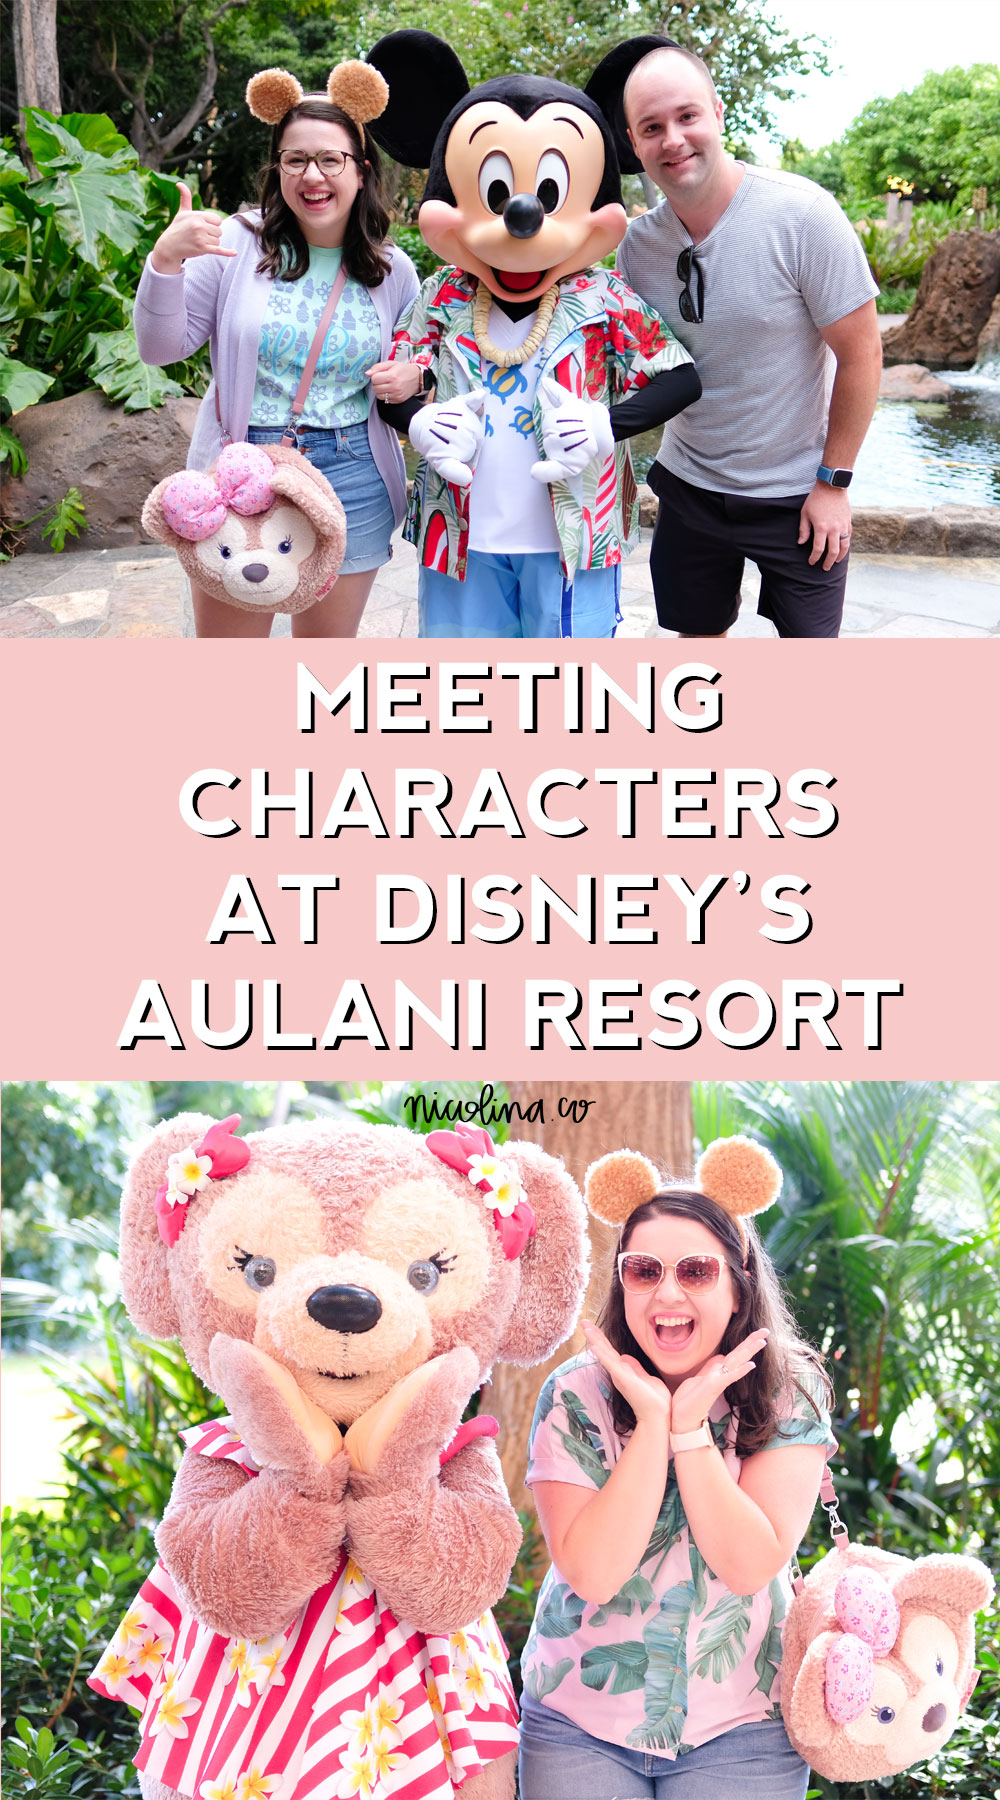 Meeting Characters at Disney's Aulani Resort